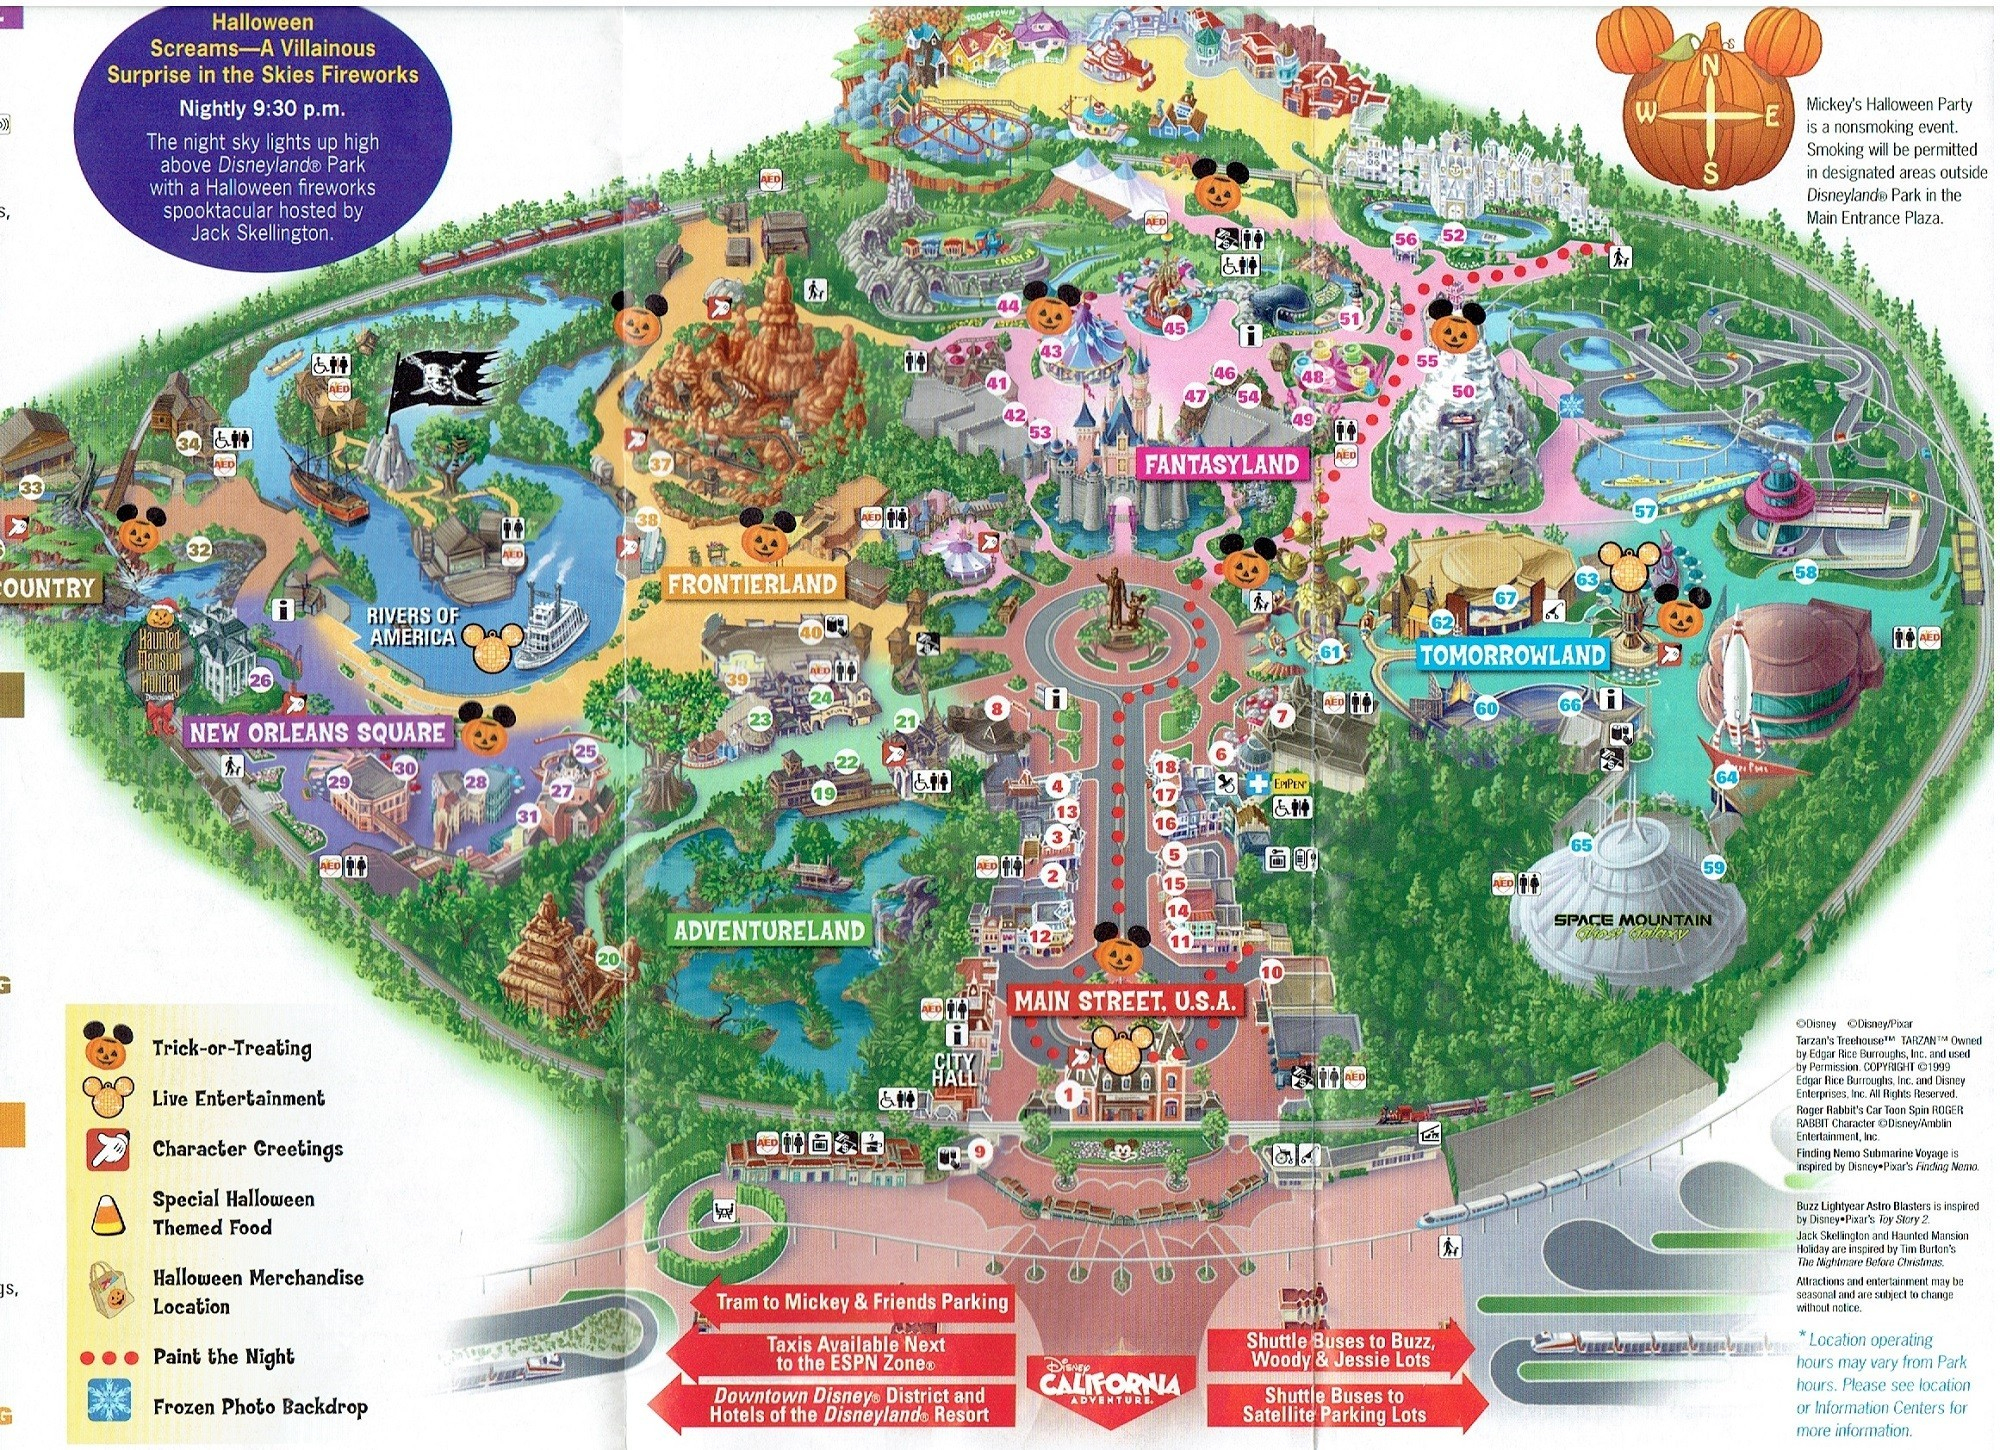 Disney World Florida Map - Mobilacomanda - Disney Orlando Florida Map